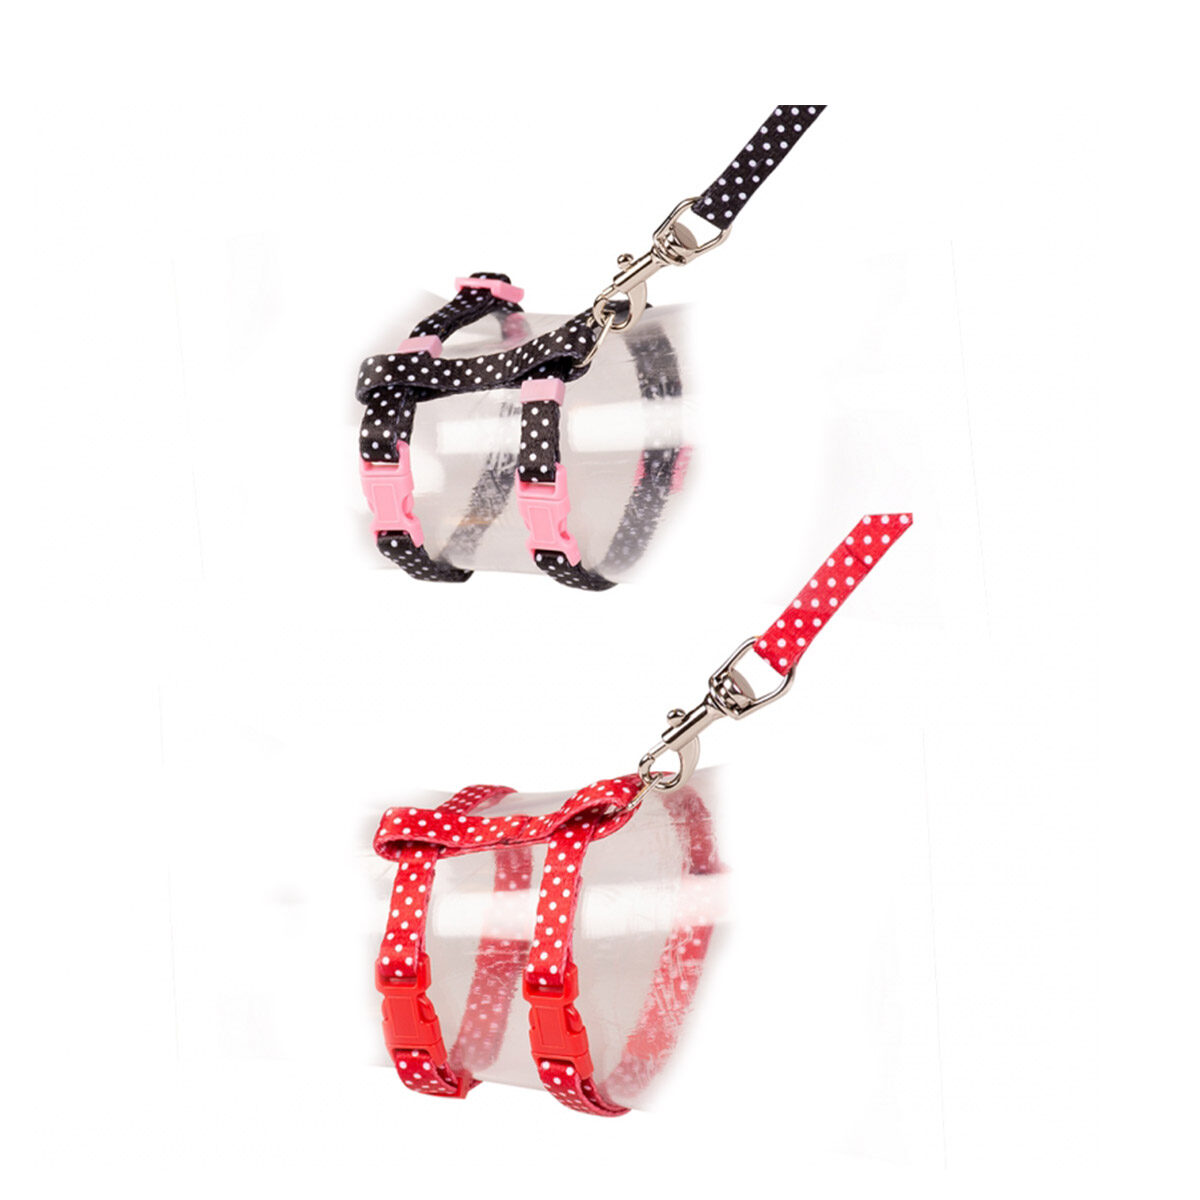 Duvo+ Kitten Wandelset Witte Bollen 15-25cm - 8mm-125cm - Zwart-Rood - in Tuigjes & Halsbanden